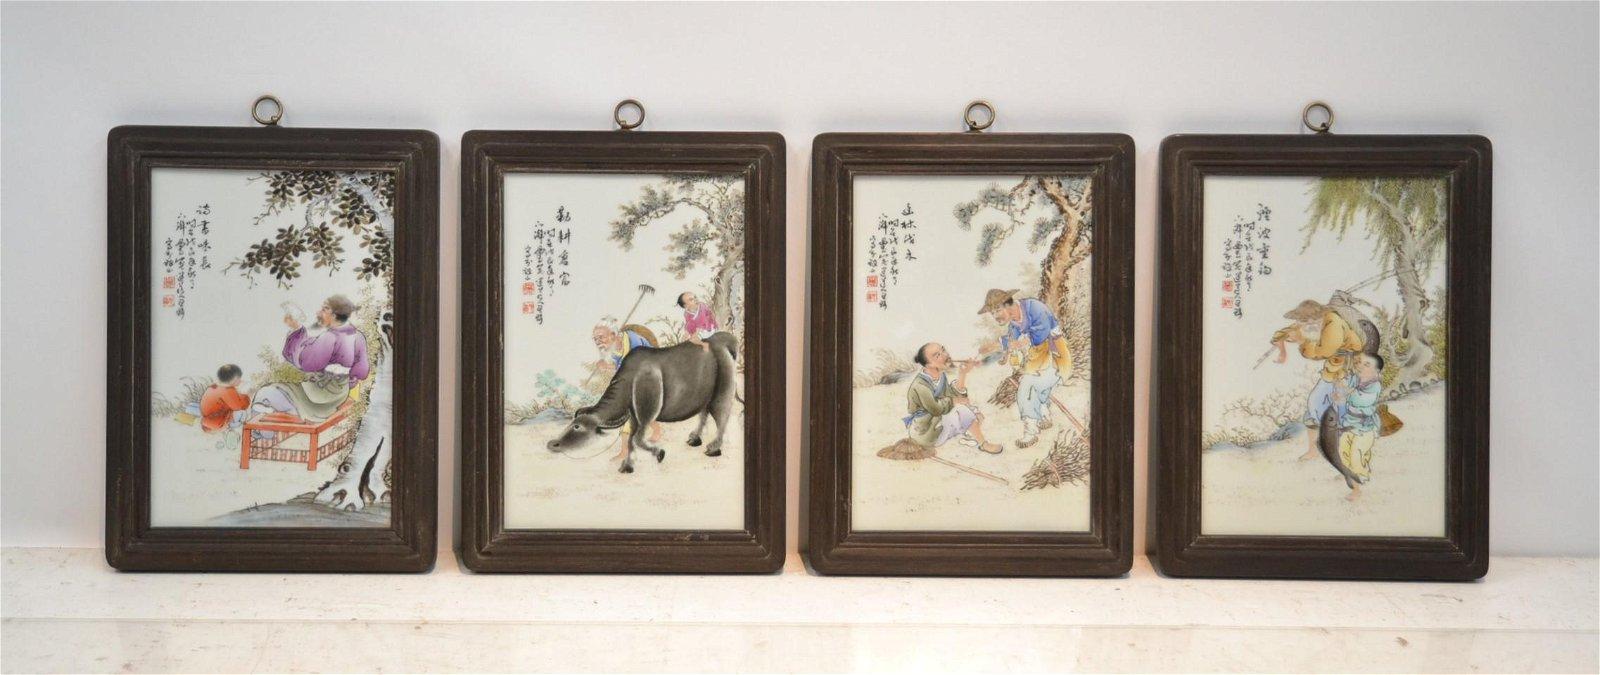 WANG QI (1884-1937) (4) CHINESE PORCELAIN PLAQUES